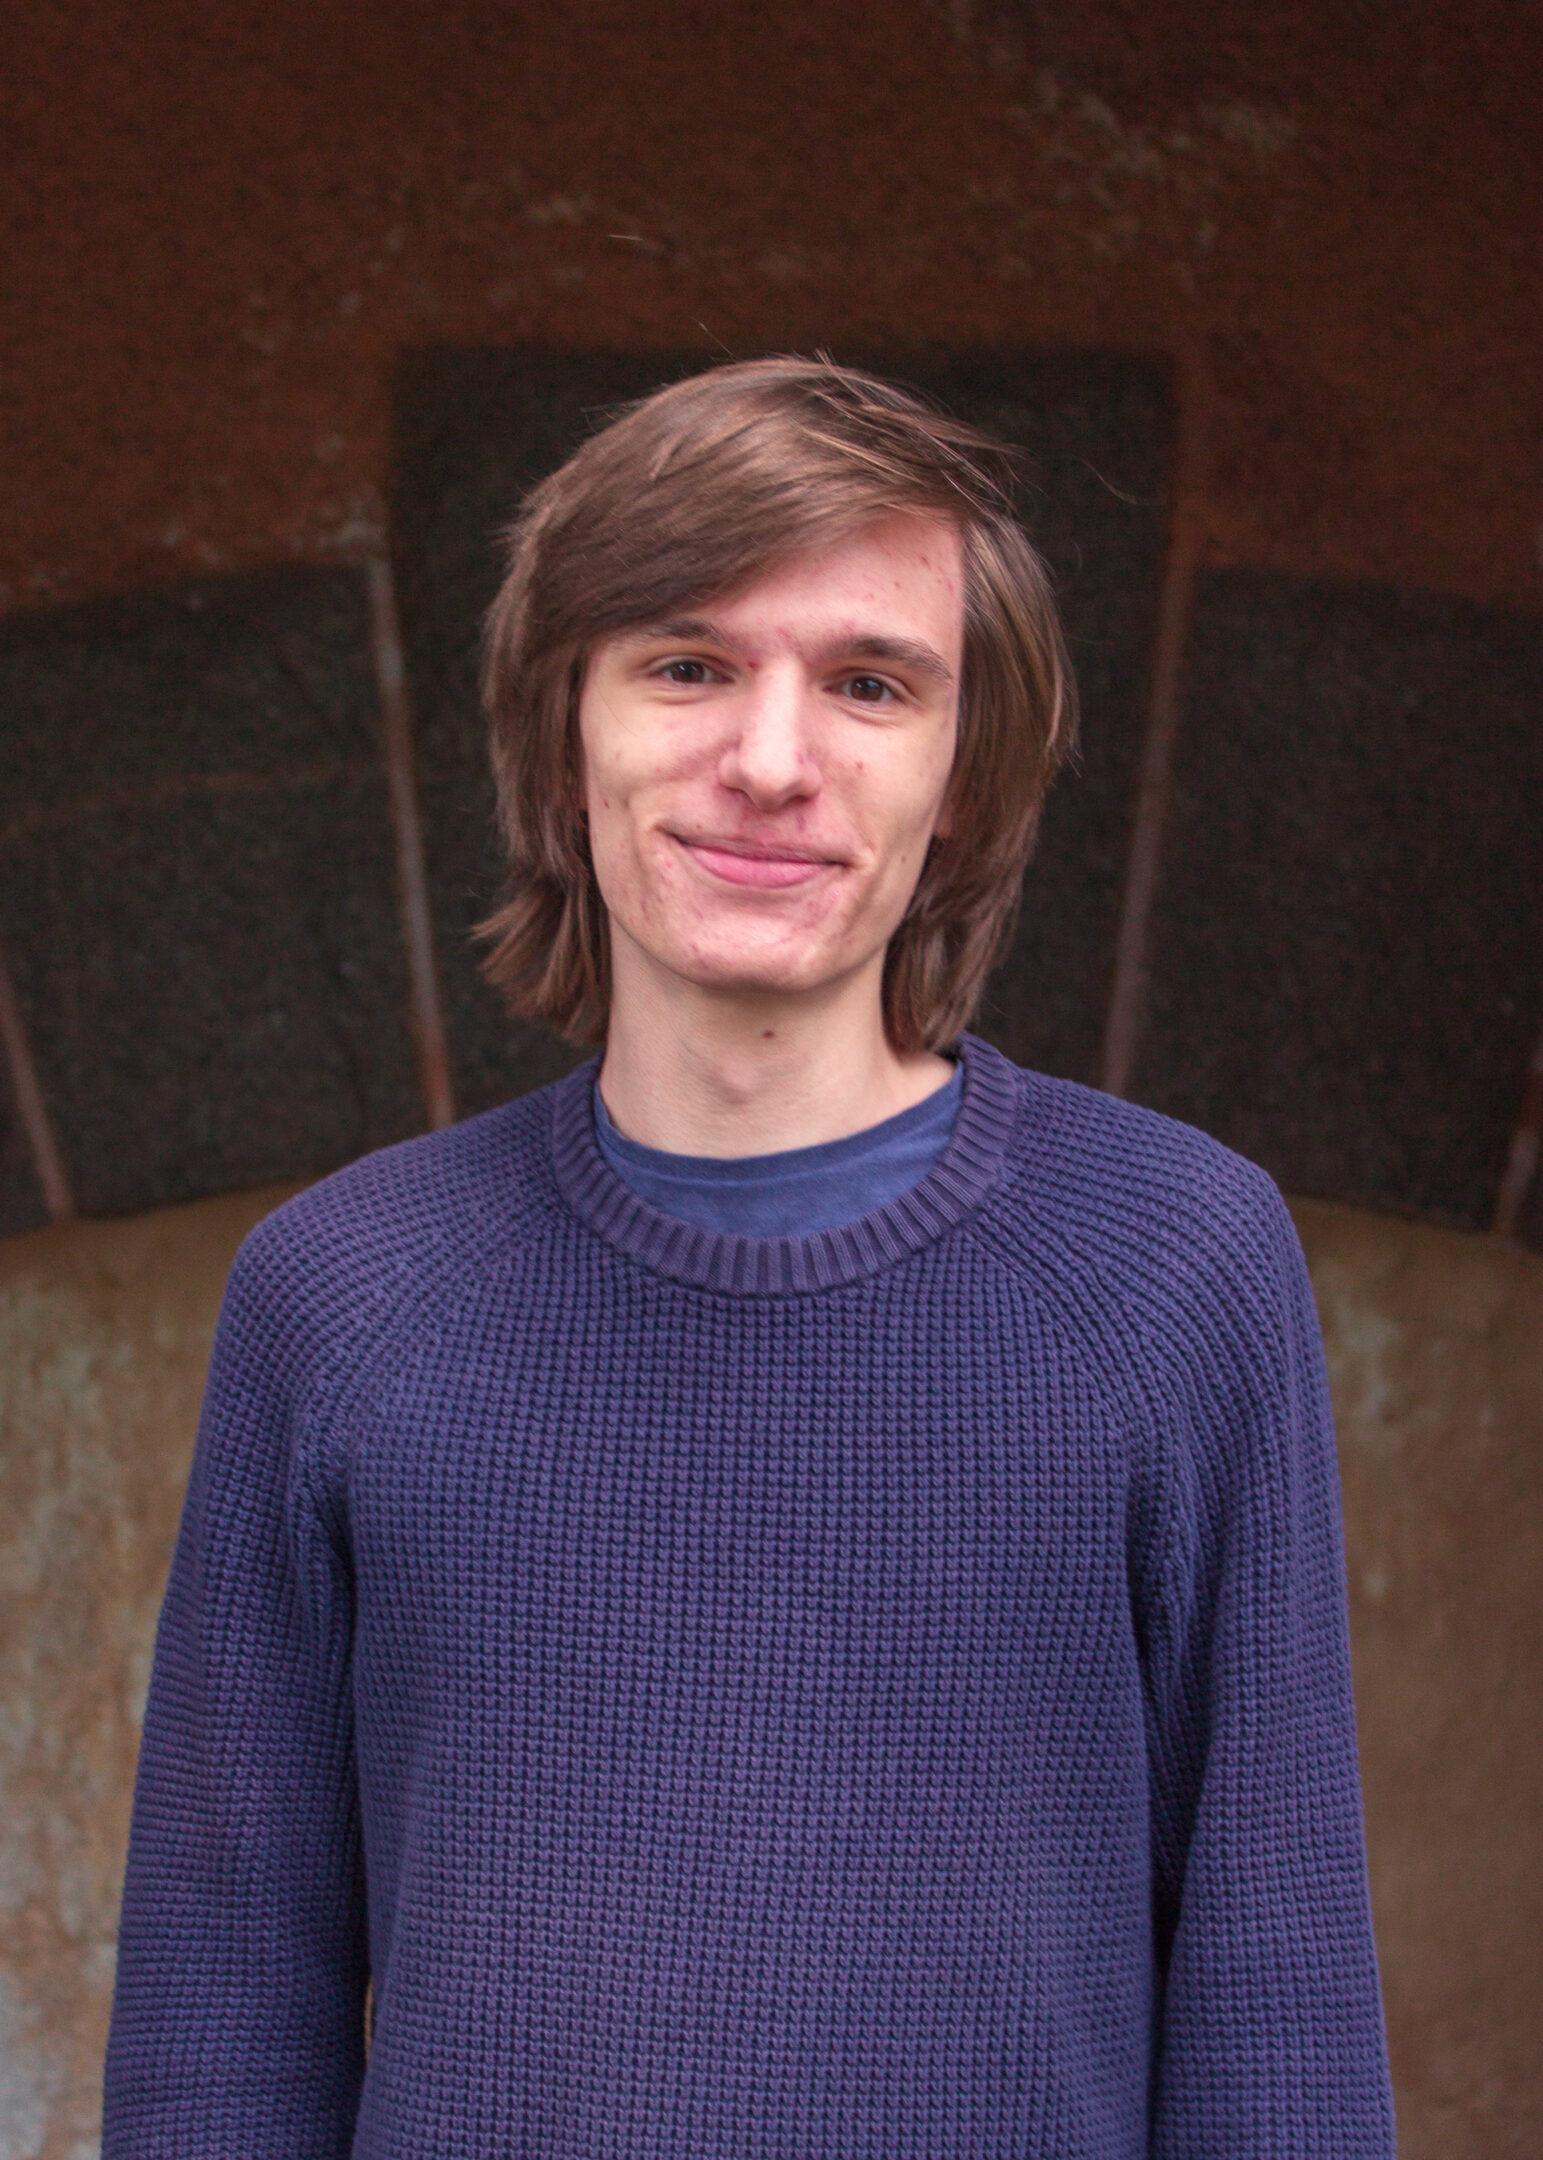 Alexander Simko